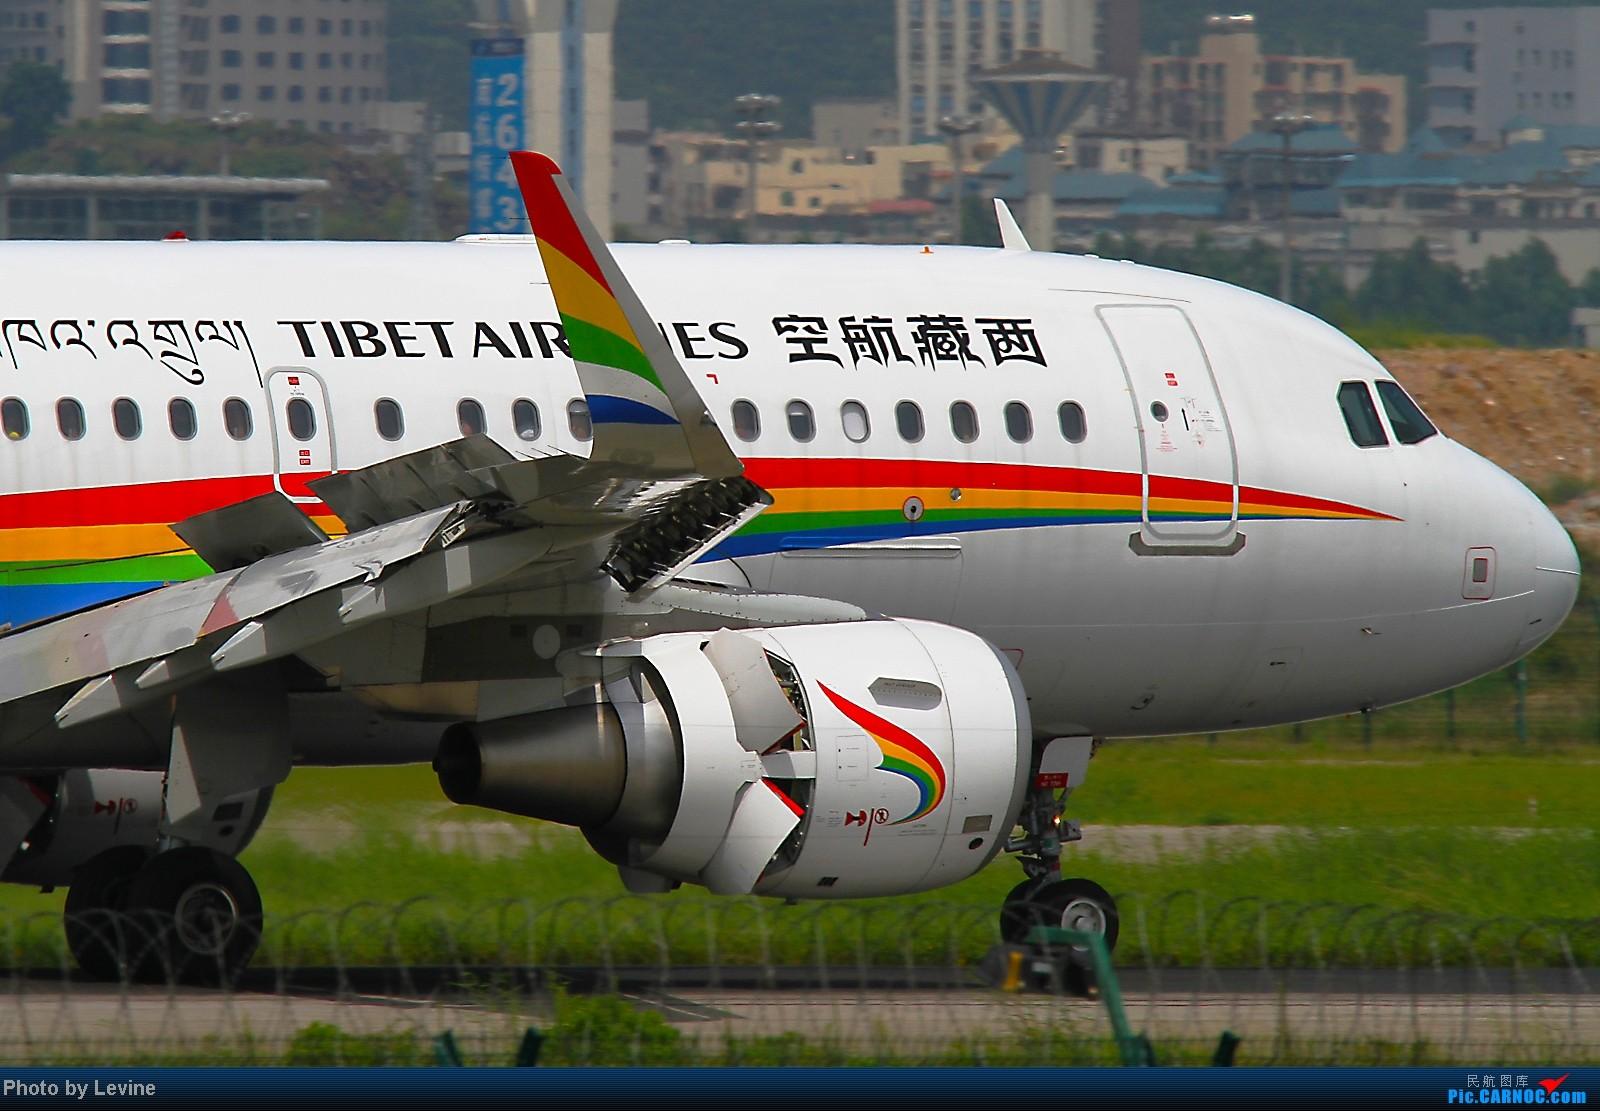 Re:[原创][深圳飞友会]夏天第一拍 小试牛刀 AIRBUS A319-100 B-6451 中国深圳宝安机场